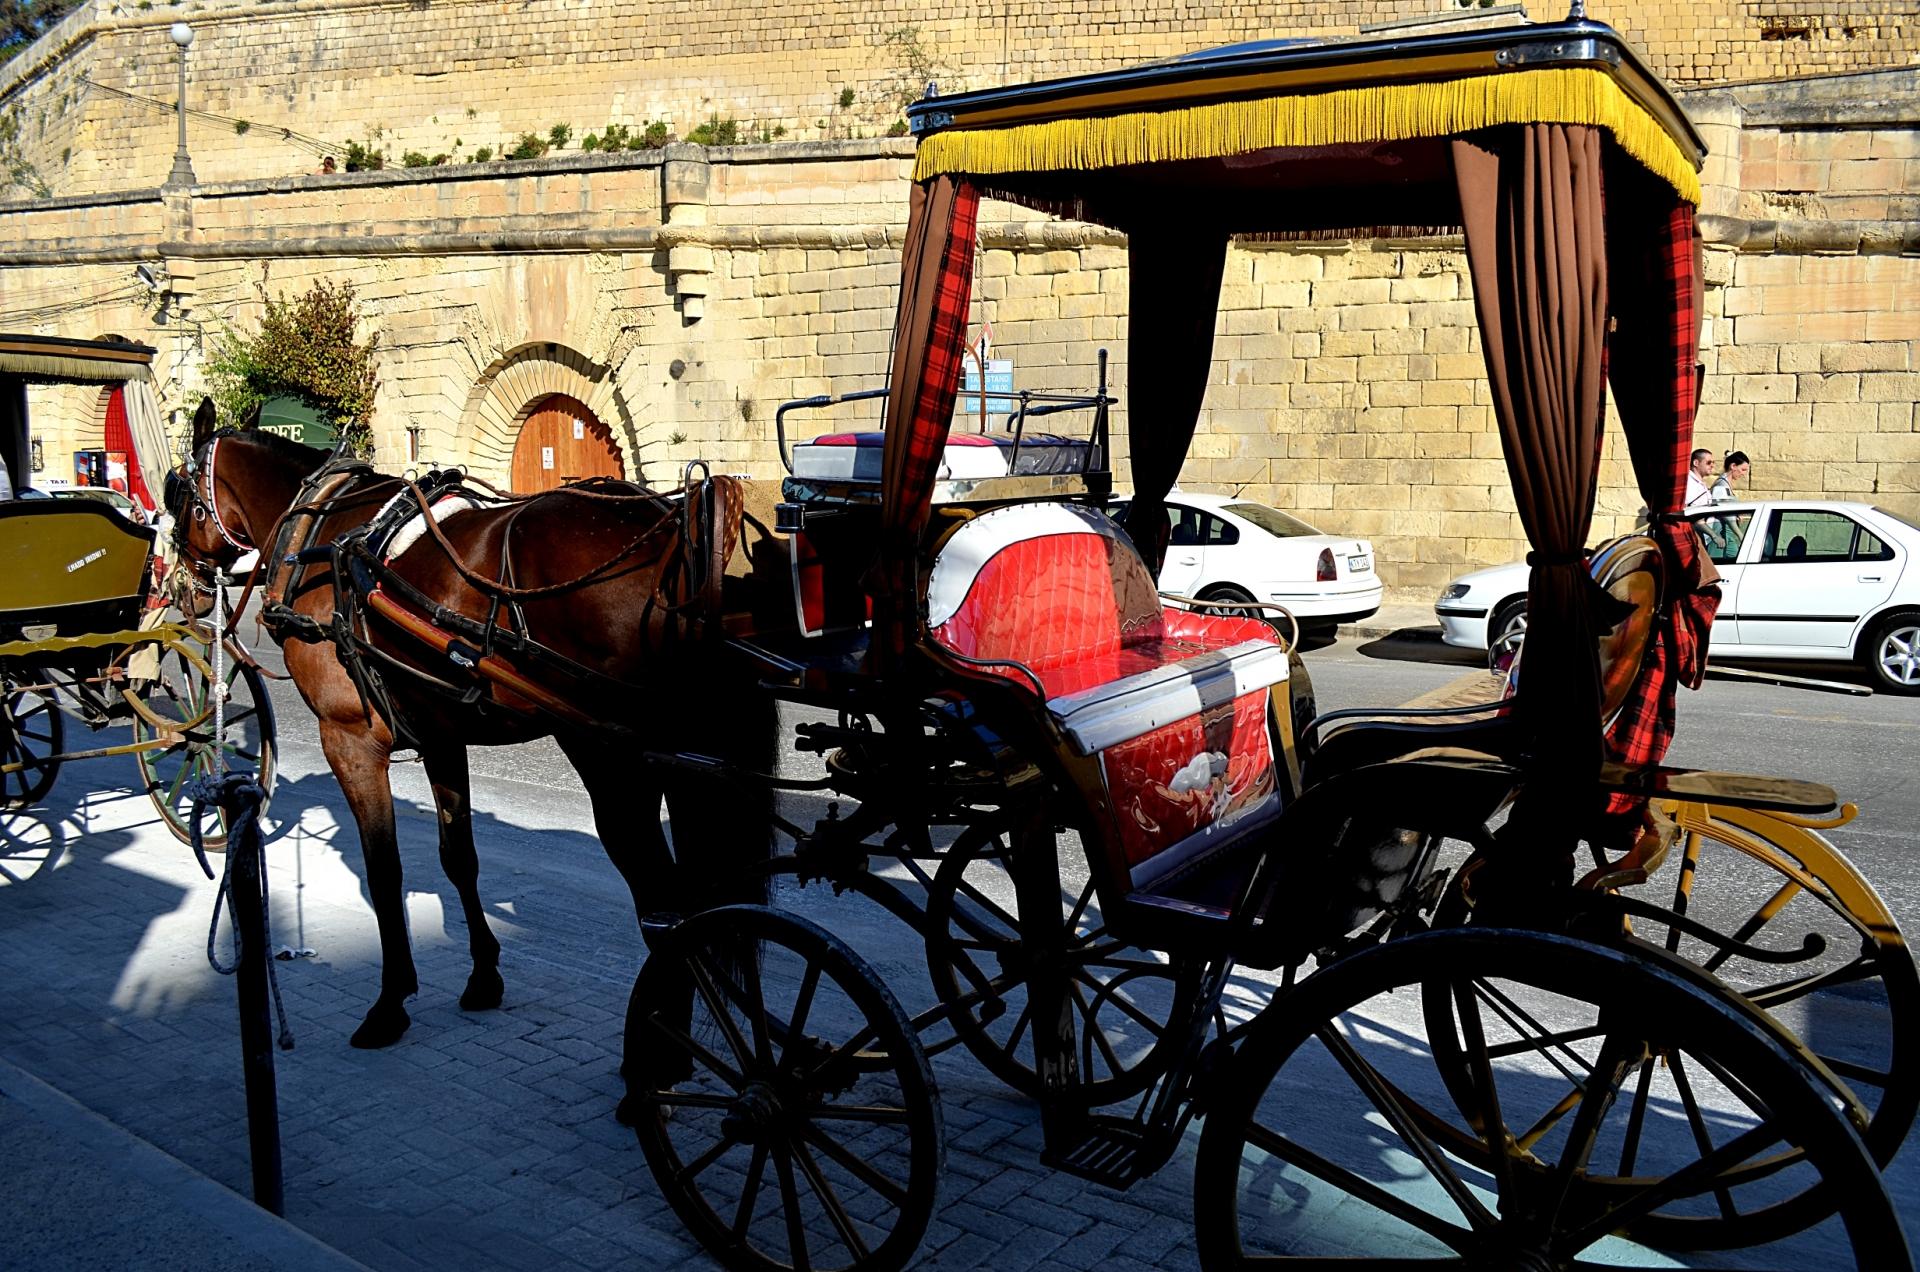 land-other-public-transport-horse-drawn-cabs-karozzini